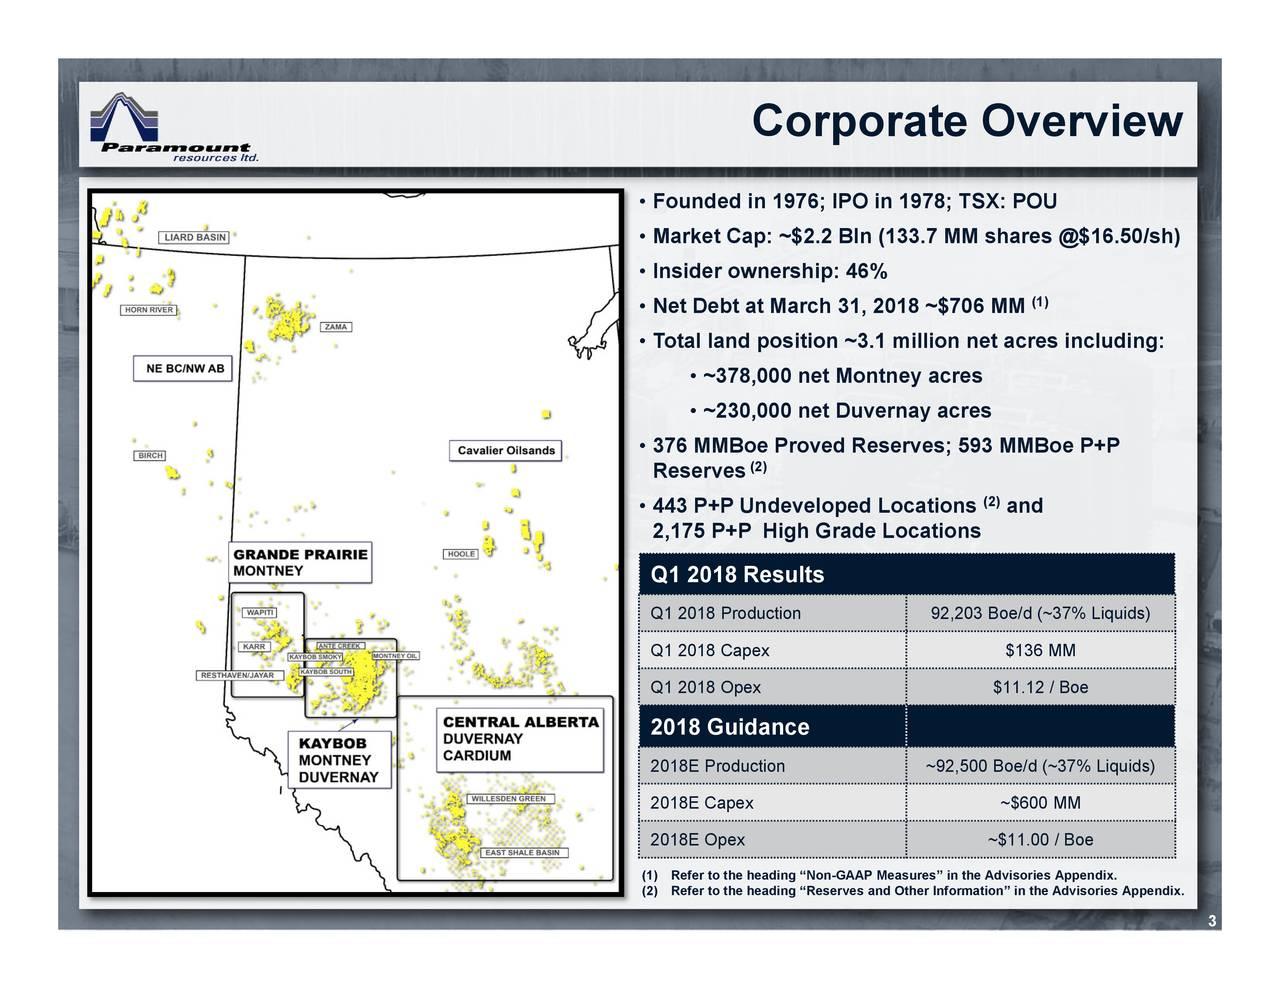 . ppendix. Advisories Appendix (1) and oe/d (~37% Liquids) (~37% Liquids) (2) Corporate Overview (2) •37•8,00,n00tMetnDnveyrnayeacres FouMndaIdsnCeaT:etIeOthna1c73ti7S32,17Q1 2Q11288 esoulsin80G8Eidoducei92,203 B $136~92,500 Be • • • • • • • (1)(2fer hetheianNo-sAvesMaenadsu